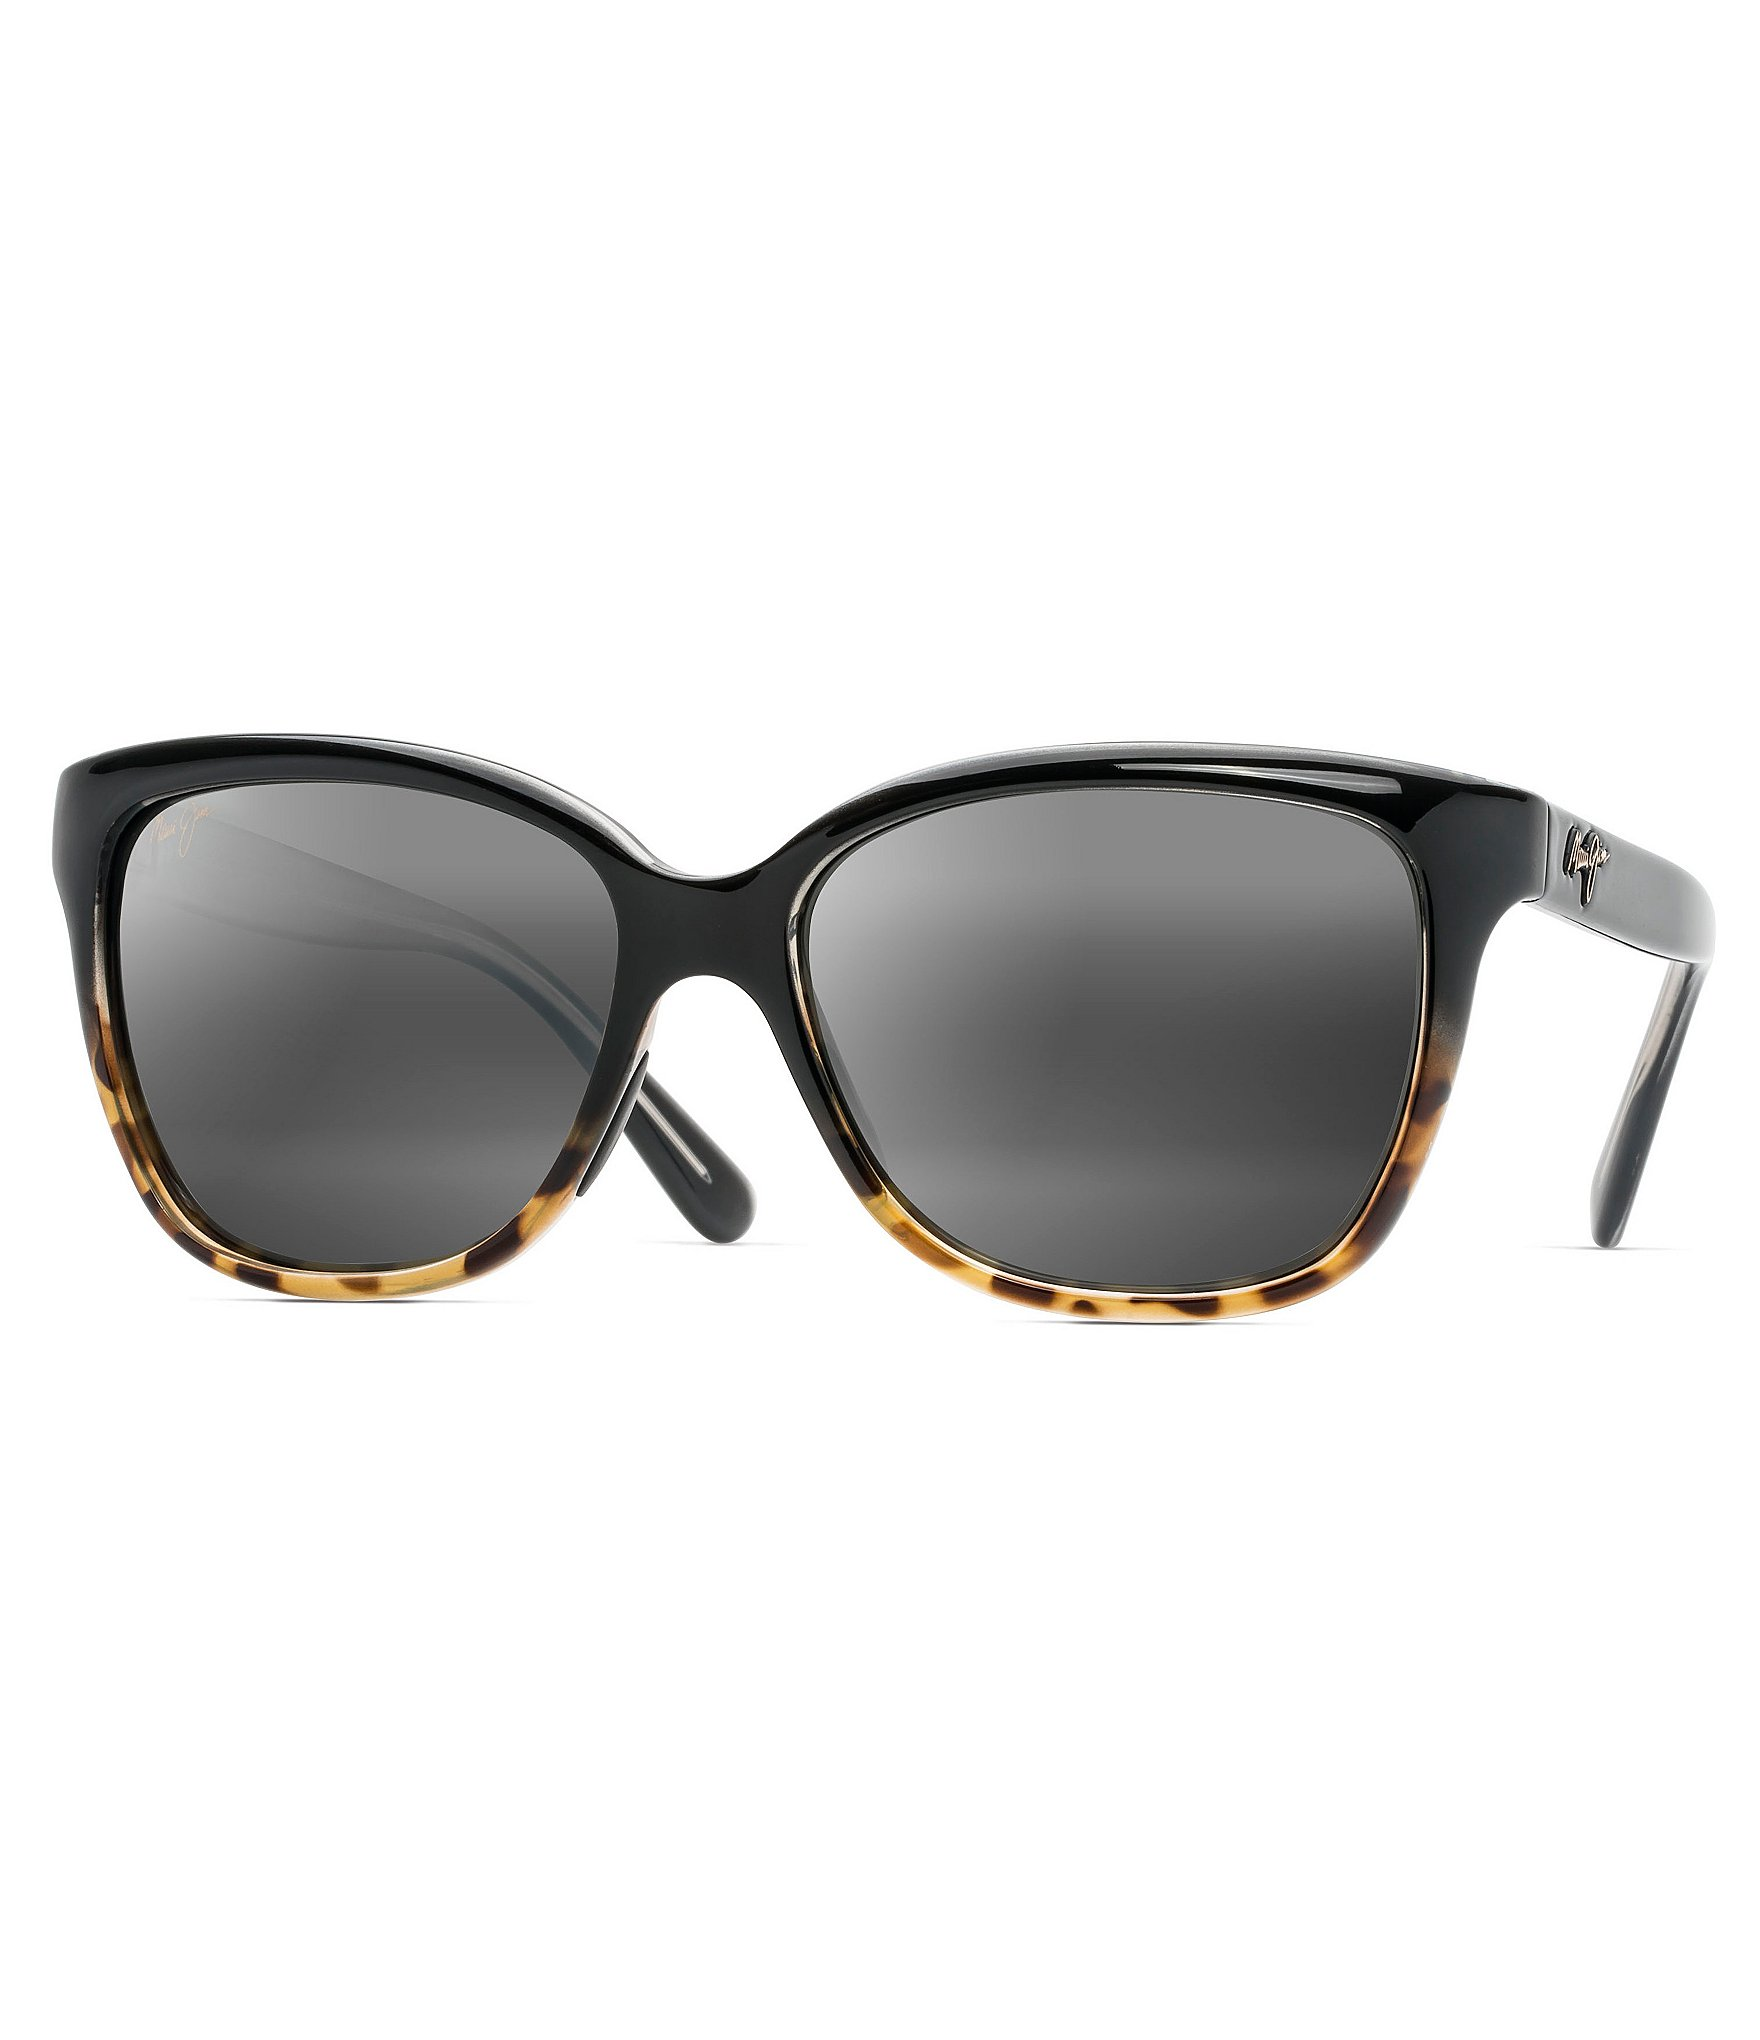 e3e603a59761 Maui Jim Starfish Gradient Polarized Square Sunglasses | Dillard's